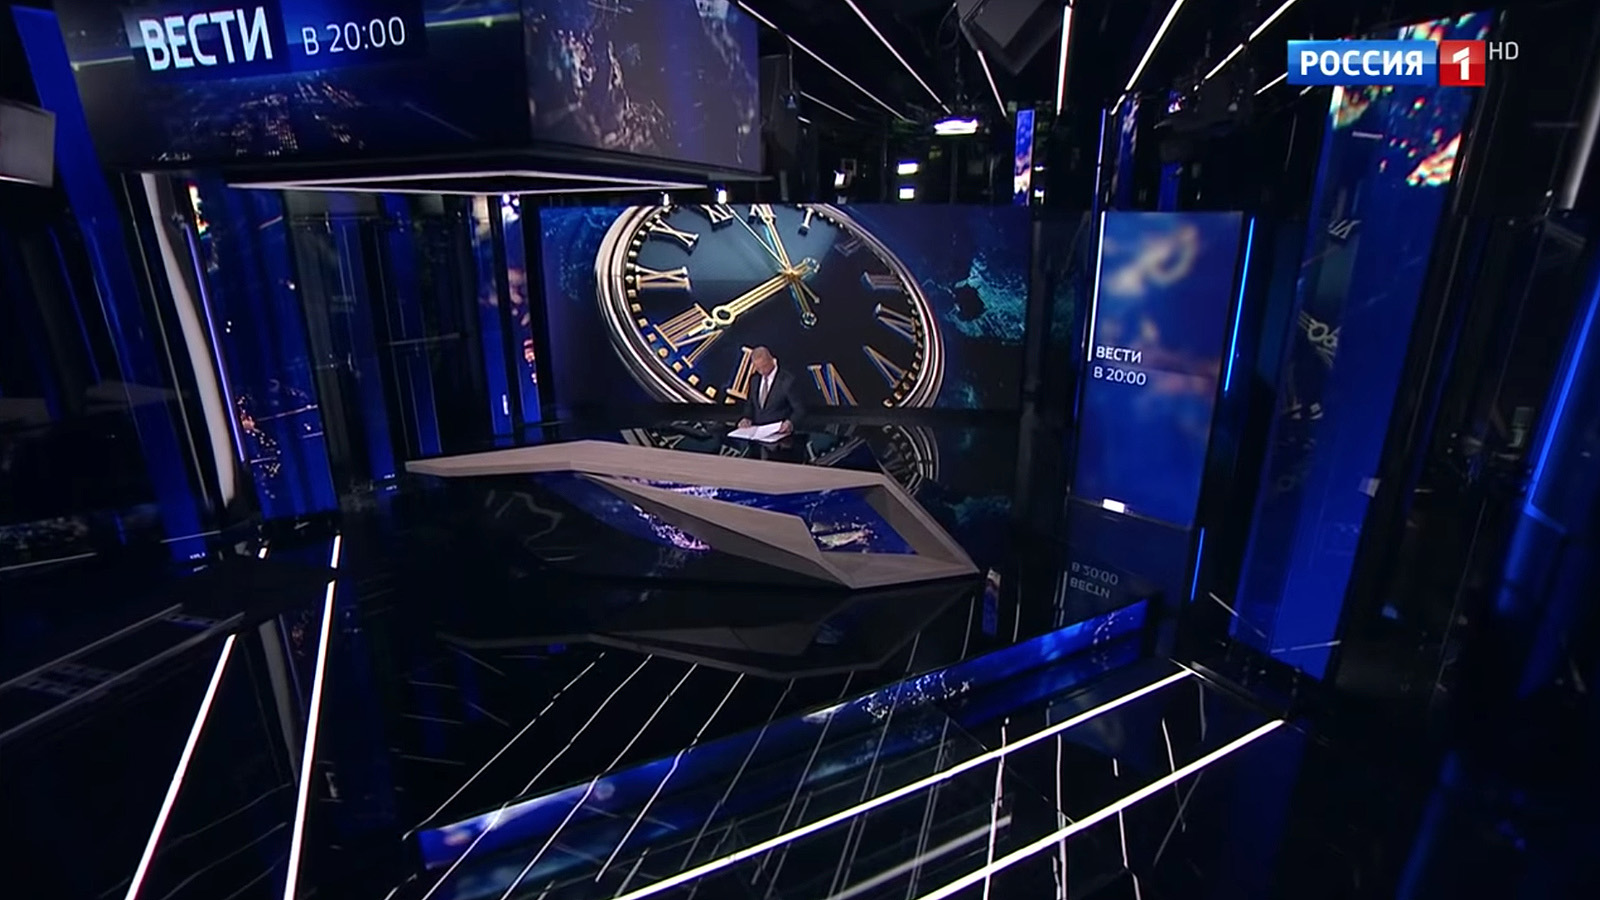 NCS_Russia-1-Vesti-Studio_0002